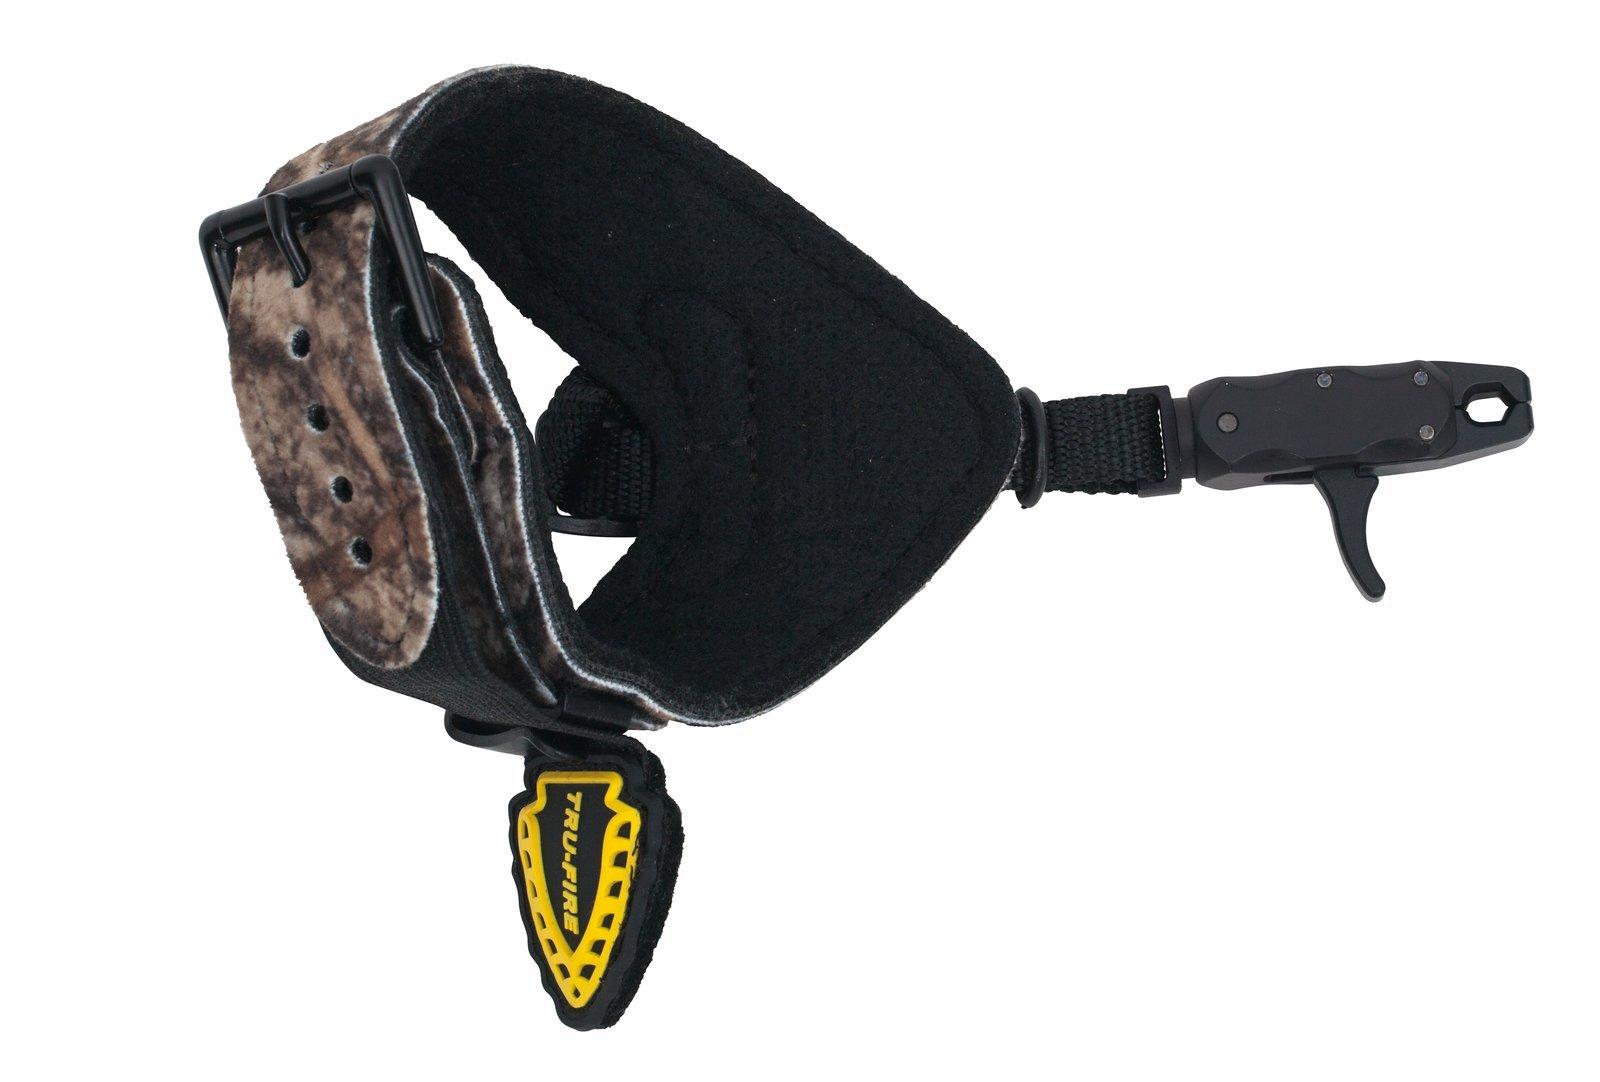 TruFire Hurricane Extreme Buckle Web Archery Compound Bow Release - Adjustable Camo Buckle Wrist Strap